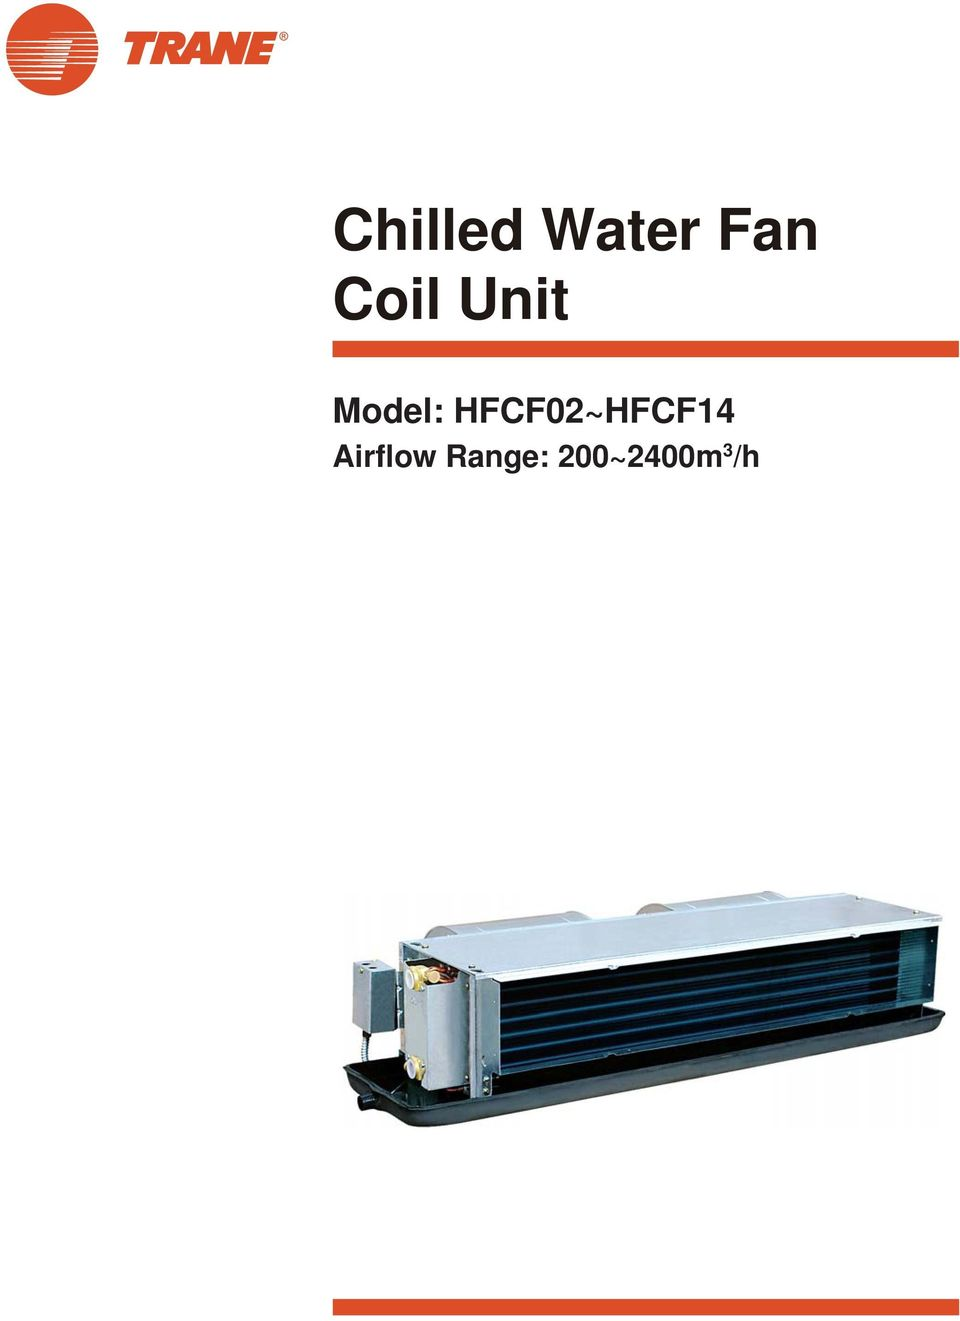 medium resolution of chilled water fan coil unit pdf trane air handler wiring diagram trane fan coil unit wiring diagram